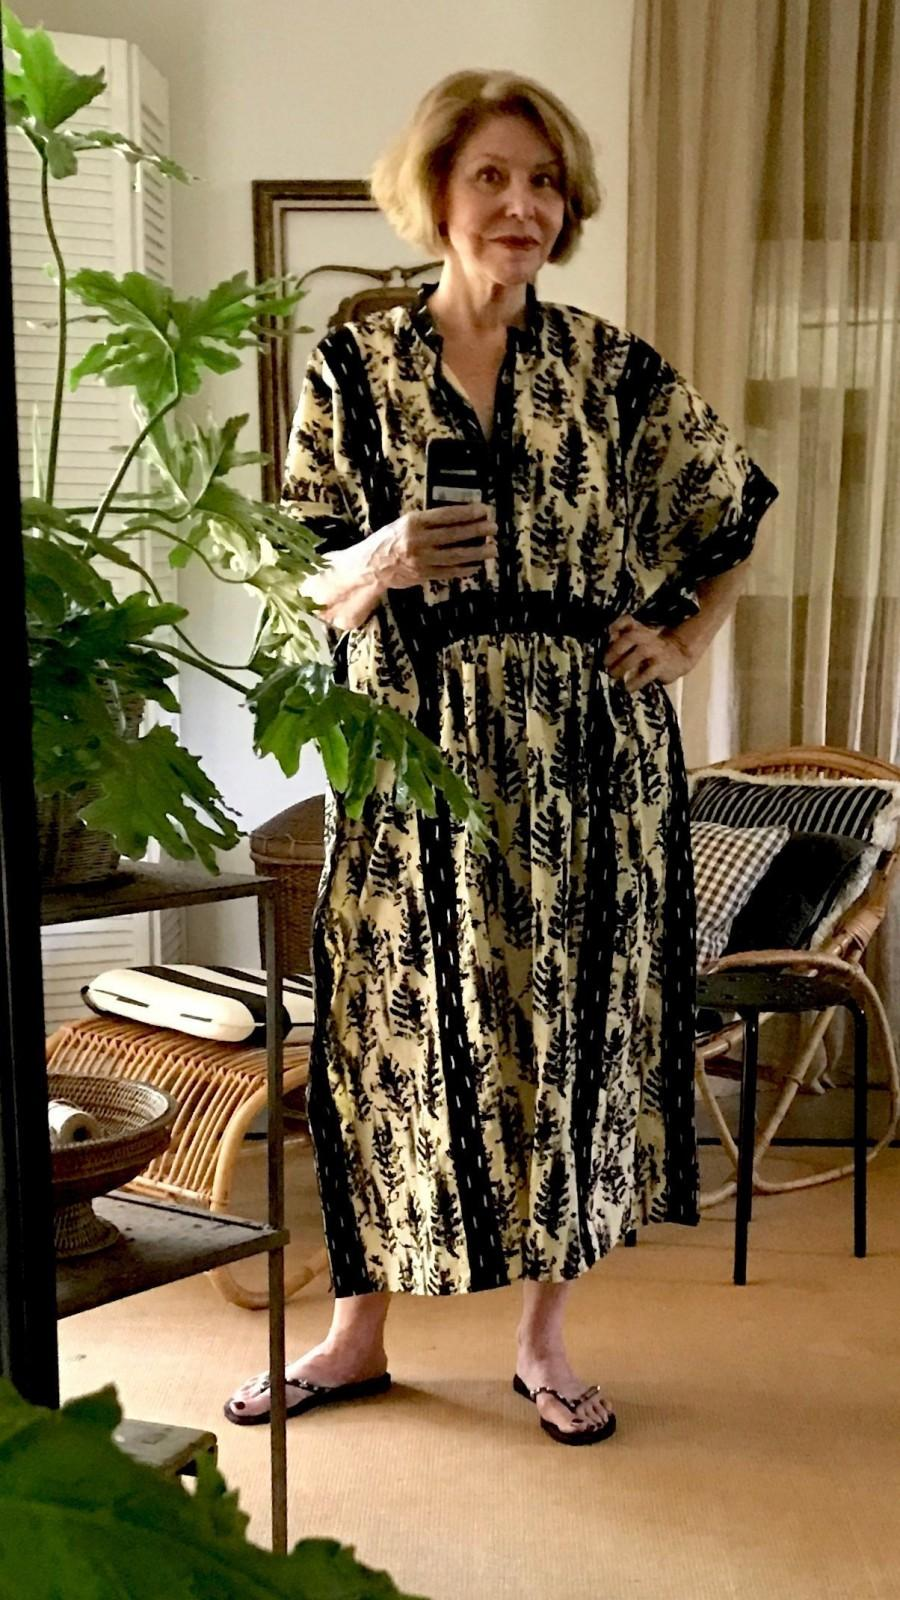 Mariage - Caftan dress, Plus size caftan, Kaftan dress, Kimono, Cotton Caftan, Cotton Kaftan, Kaftan maxi dress, Long Caftan, Maxi dress, Cape dress